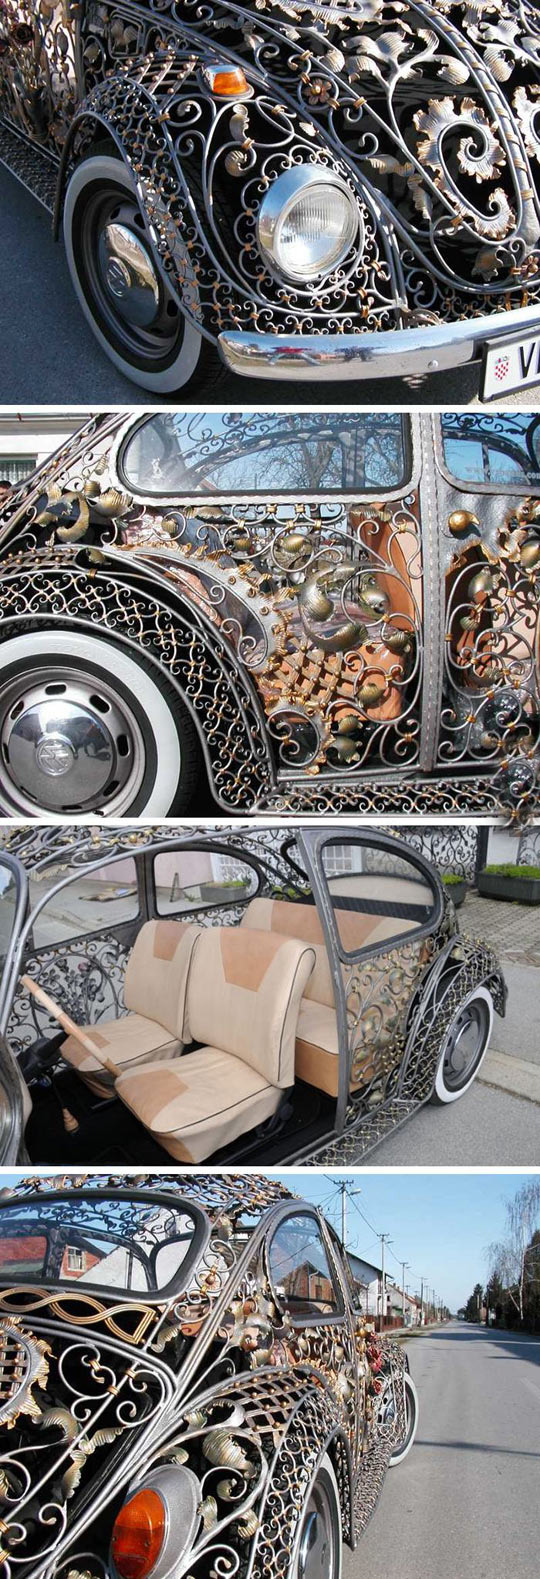 Incredible bug body from a Croatian metalwork shop…